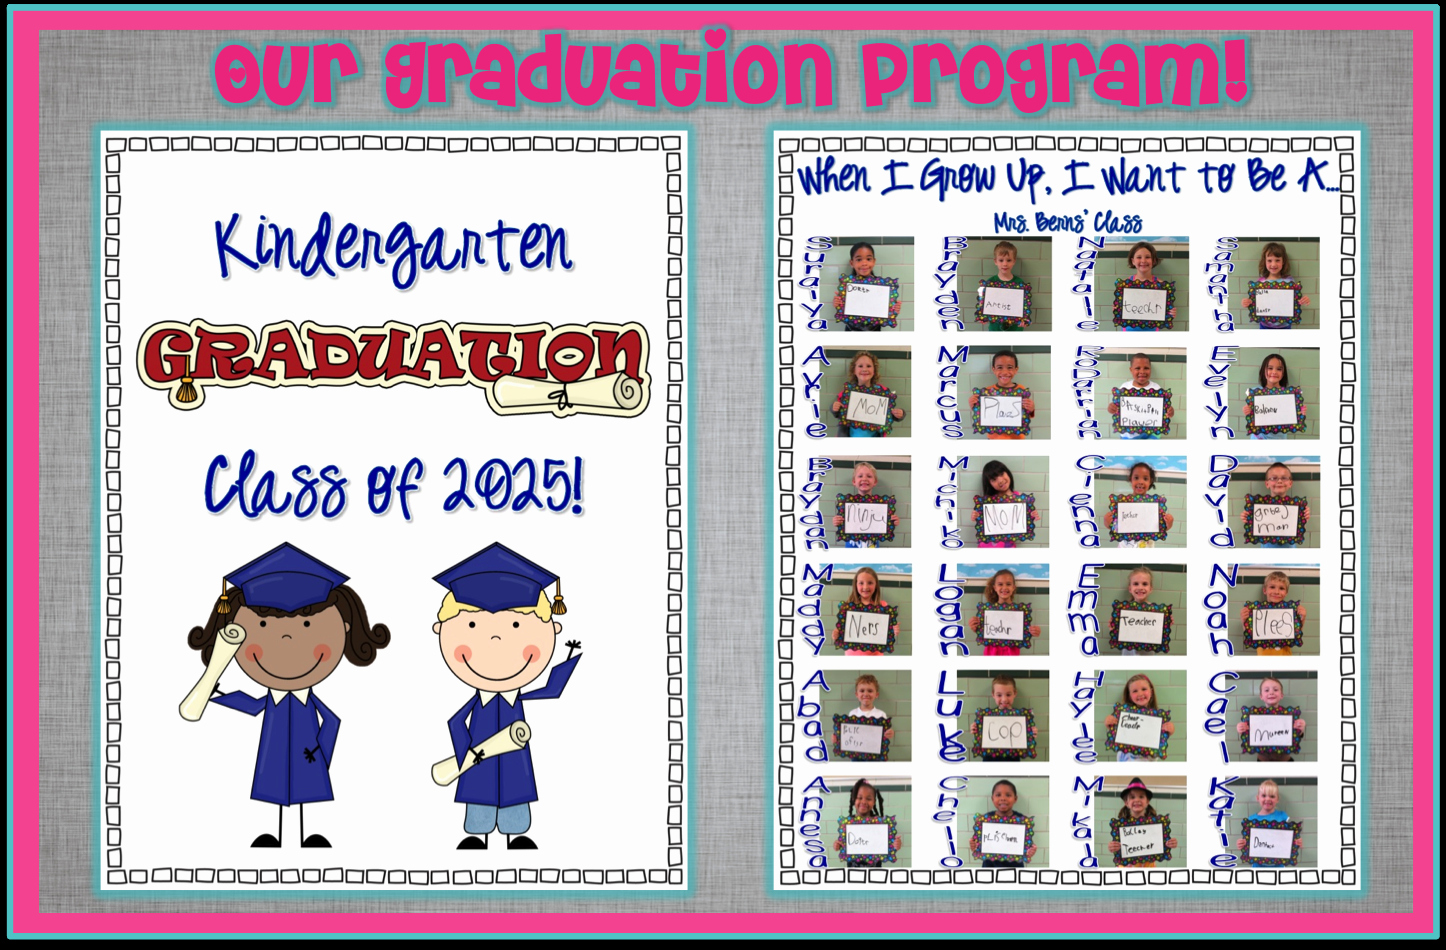 Preschool Graduation Program Template Unique Kindergarten Graduation